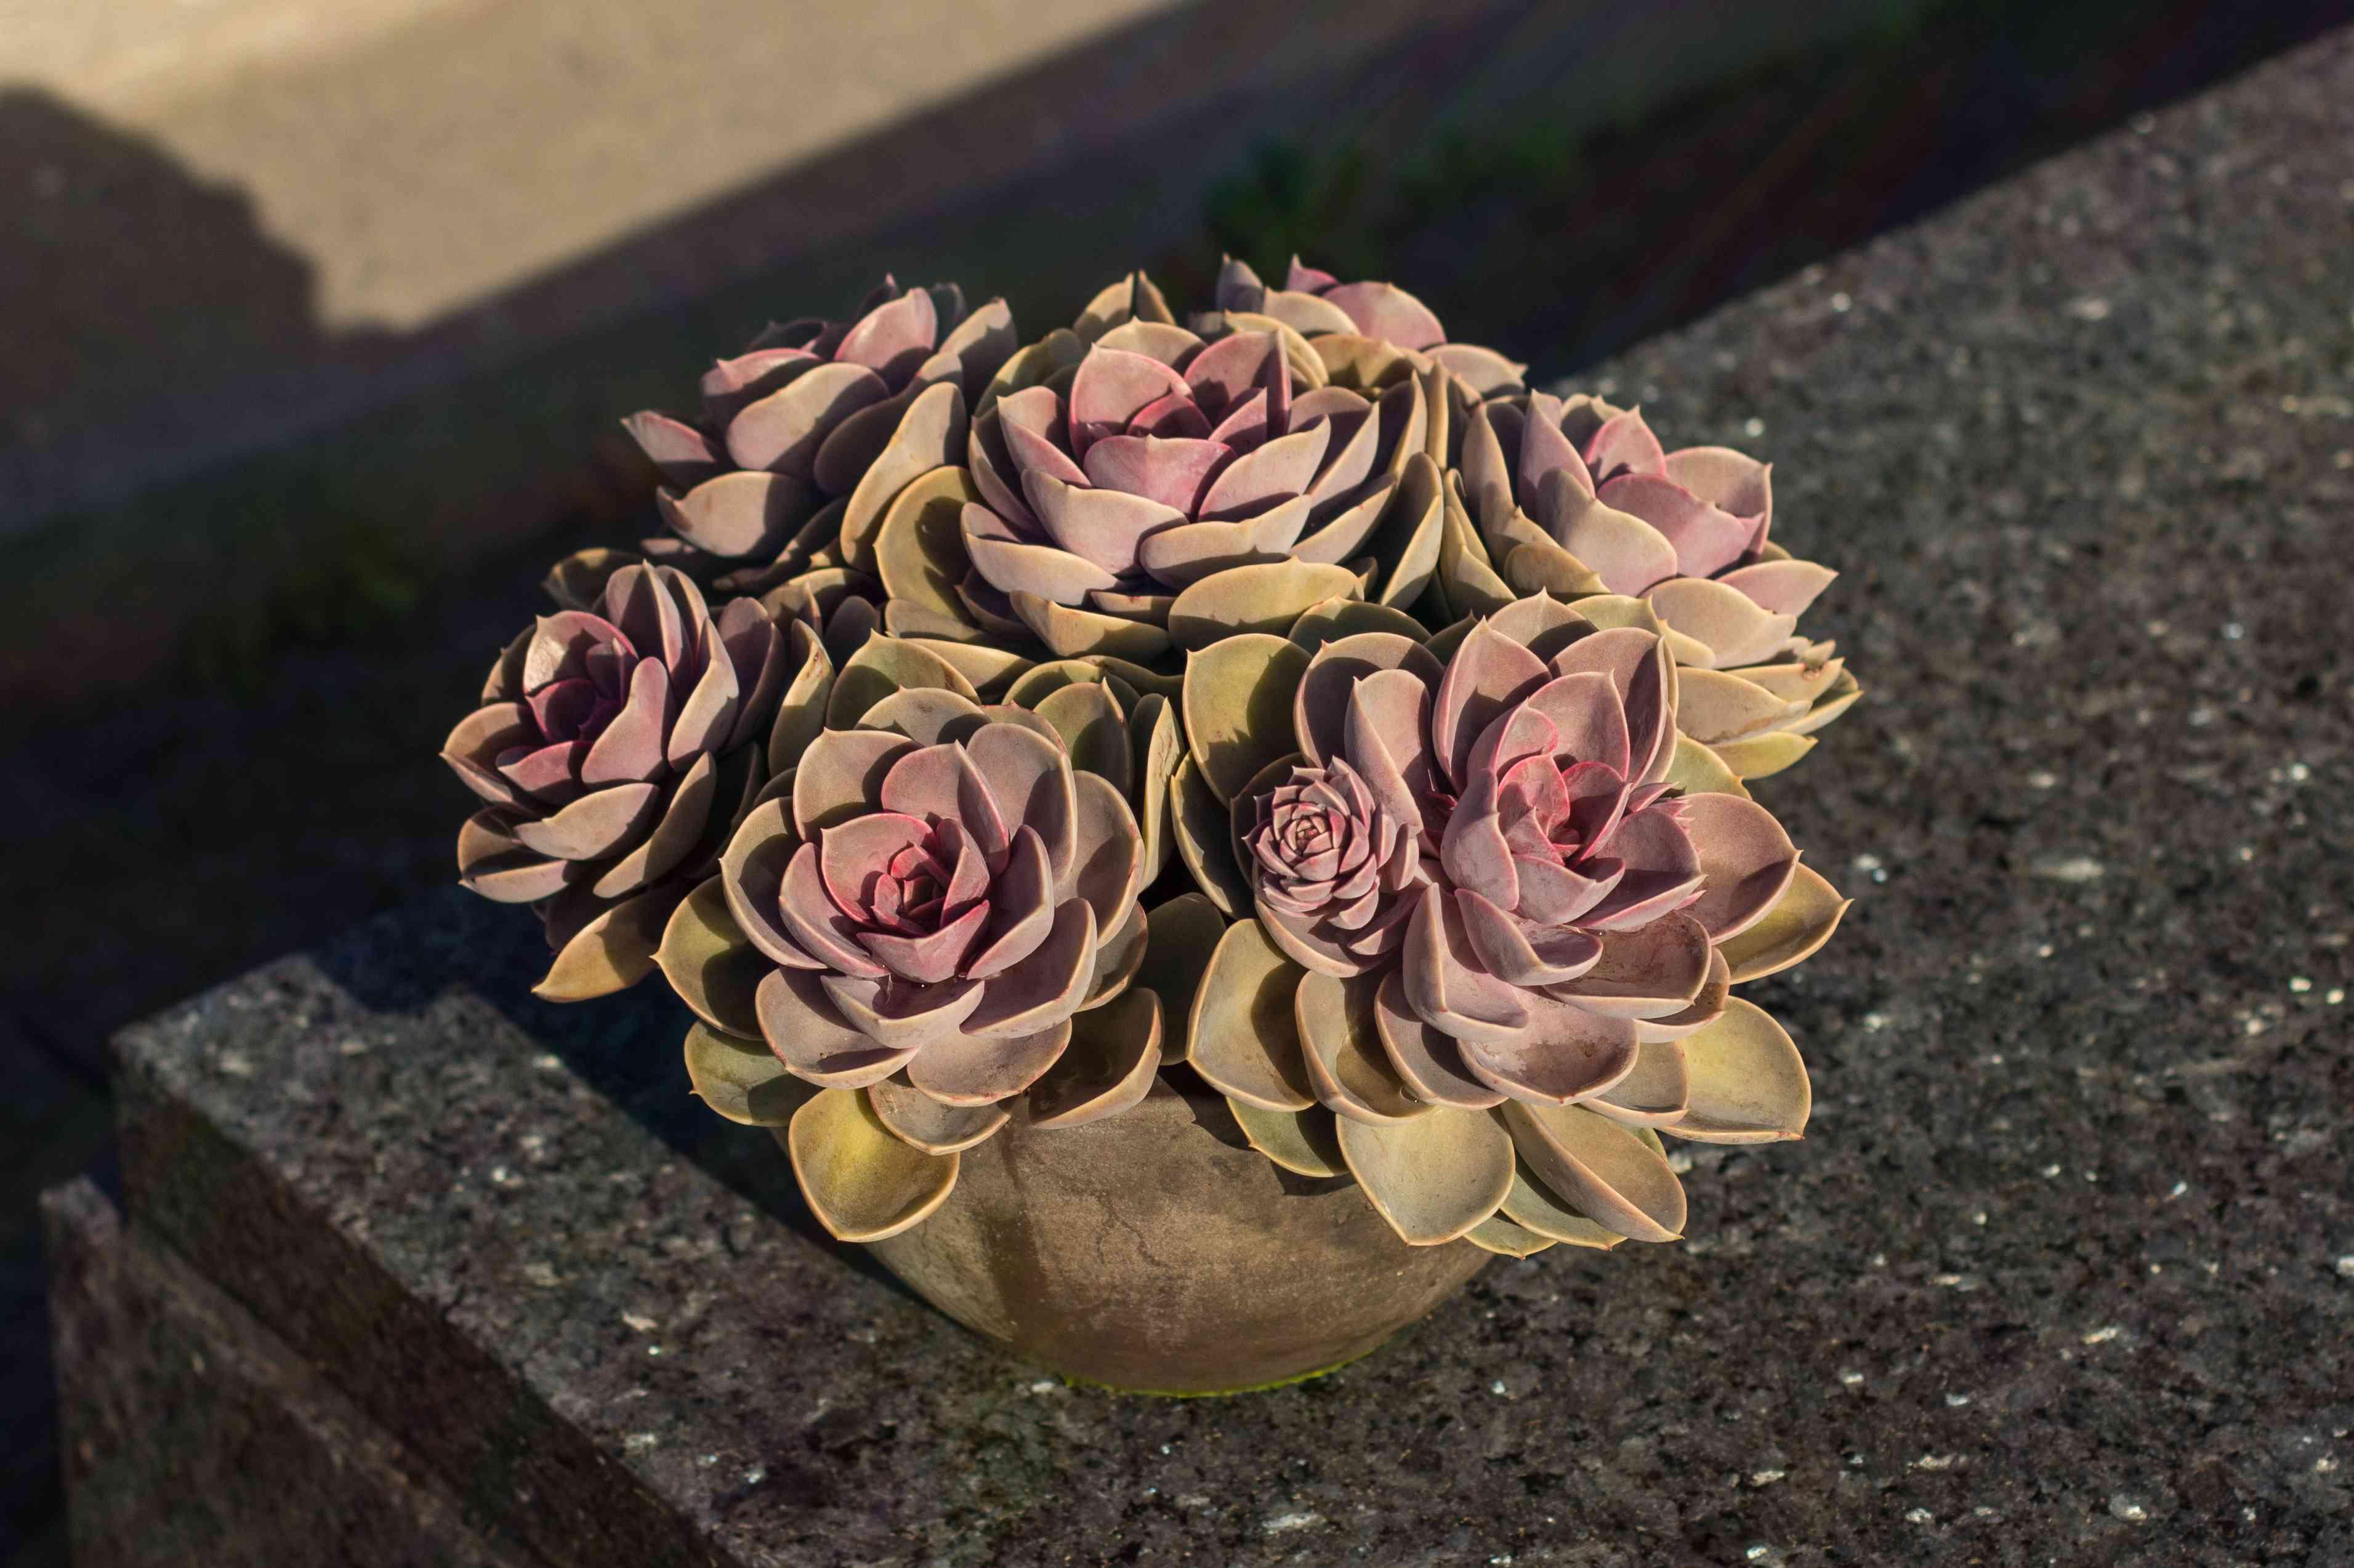 Outdoor succulent Echeveria Perle Von Nurnberg got bright colors due to temperature drop at night. Seven echeverias planted together.